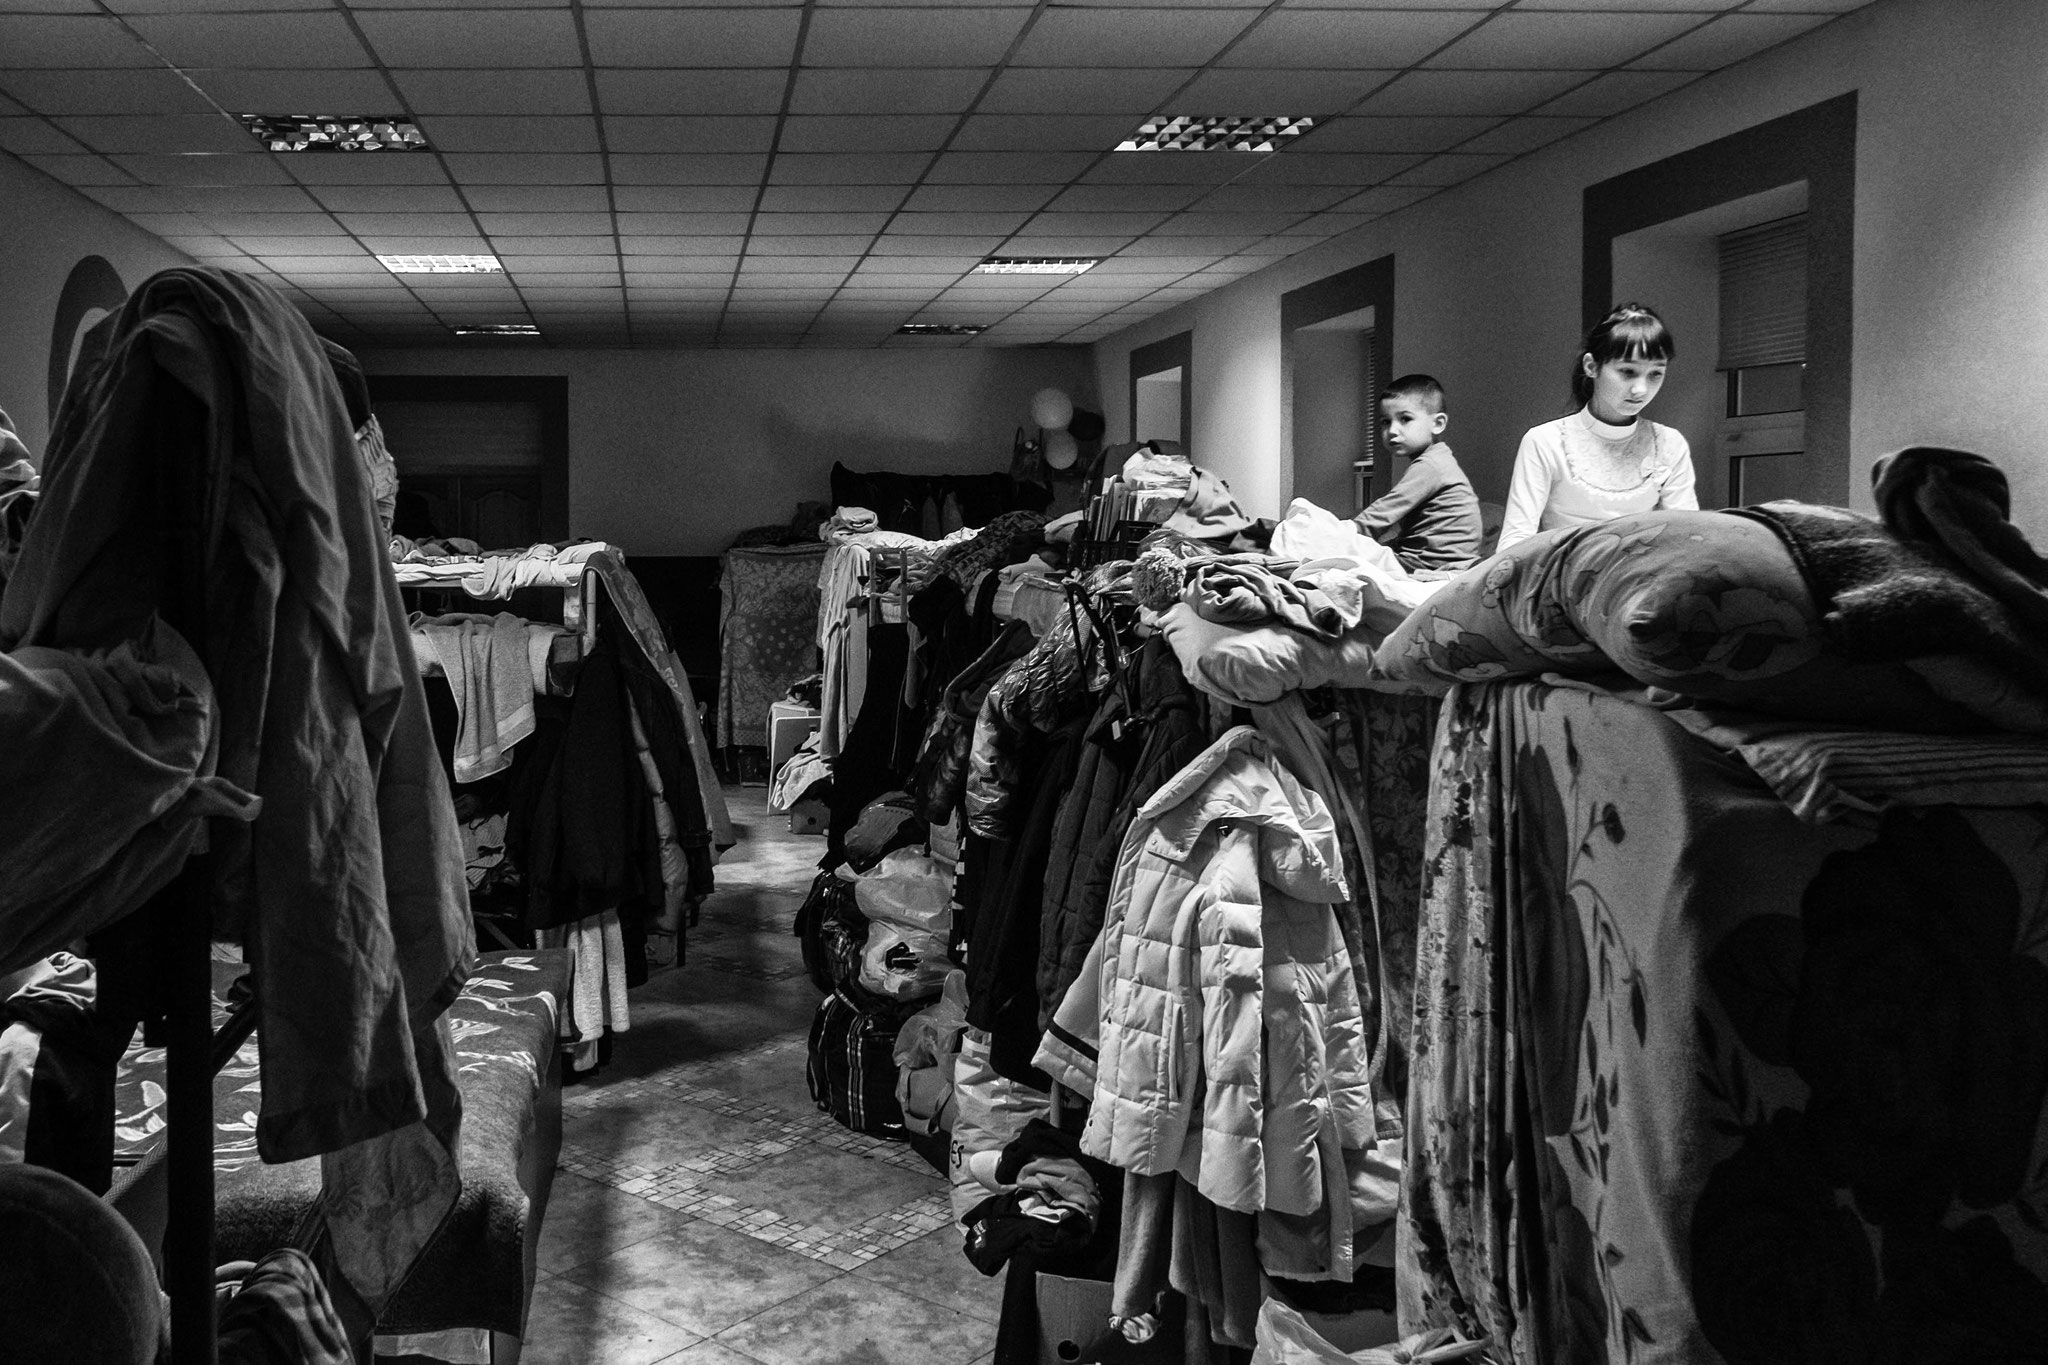 Collective House for IDPs, a former Kindergarden, Kiev Nov. 2014